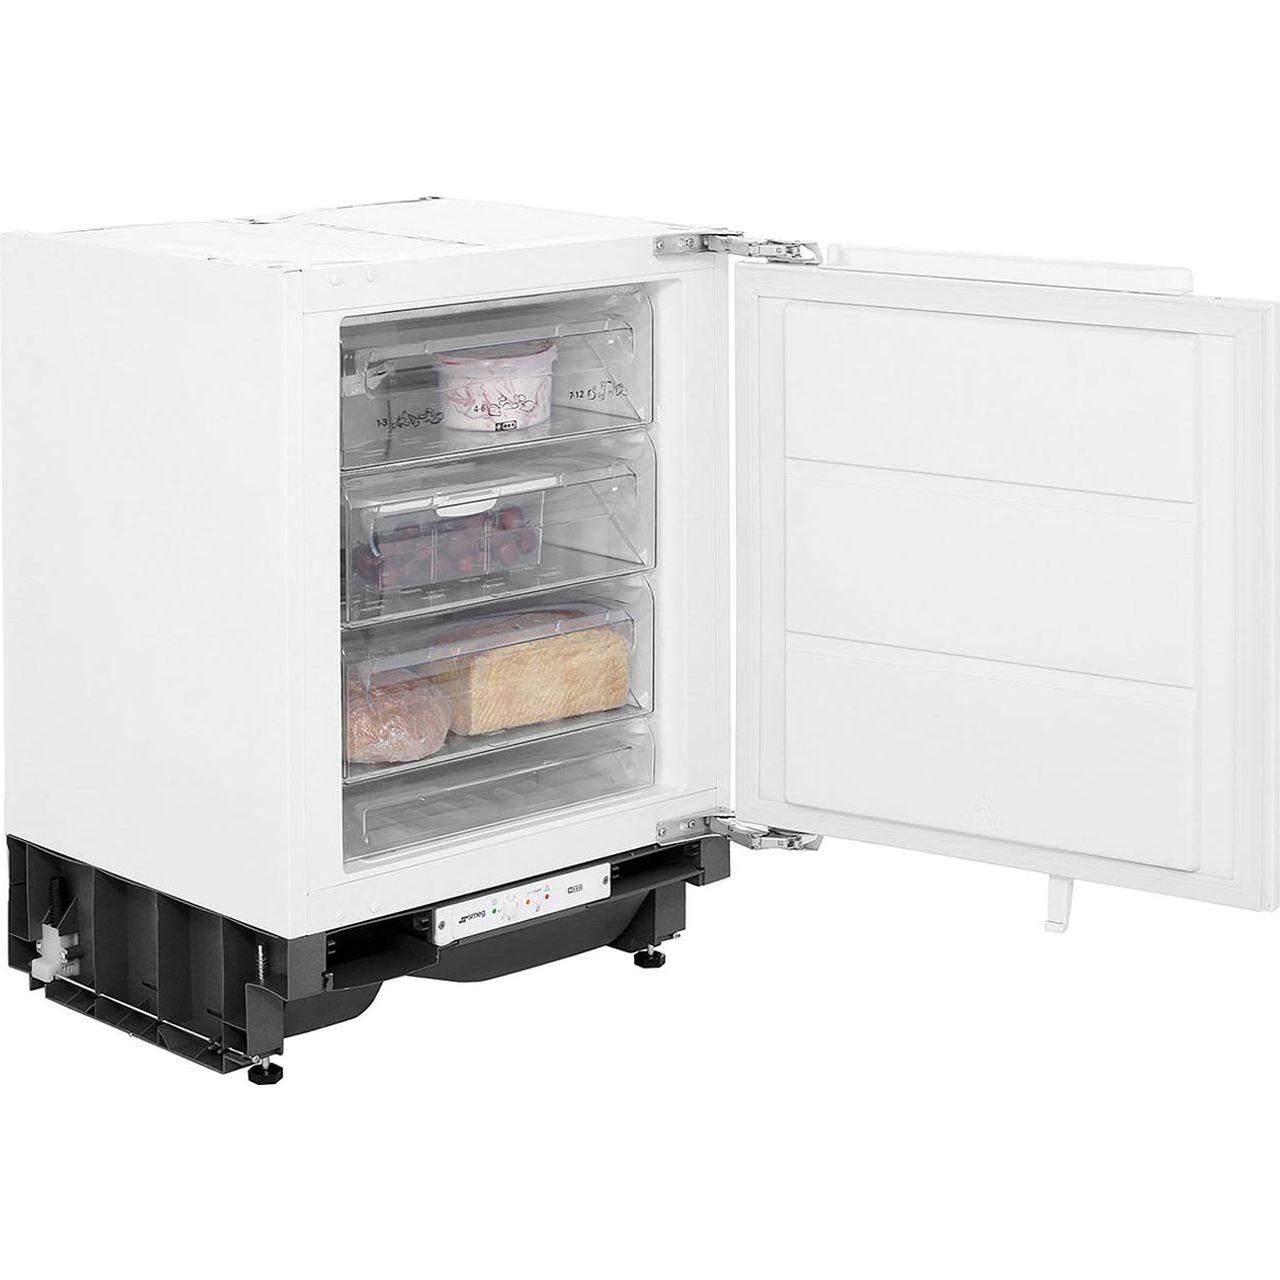 Smeg UKUD7108FSEP Integrated Under Counter Freezer review